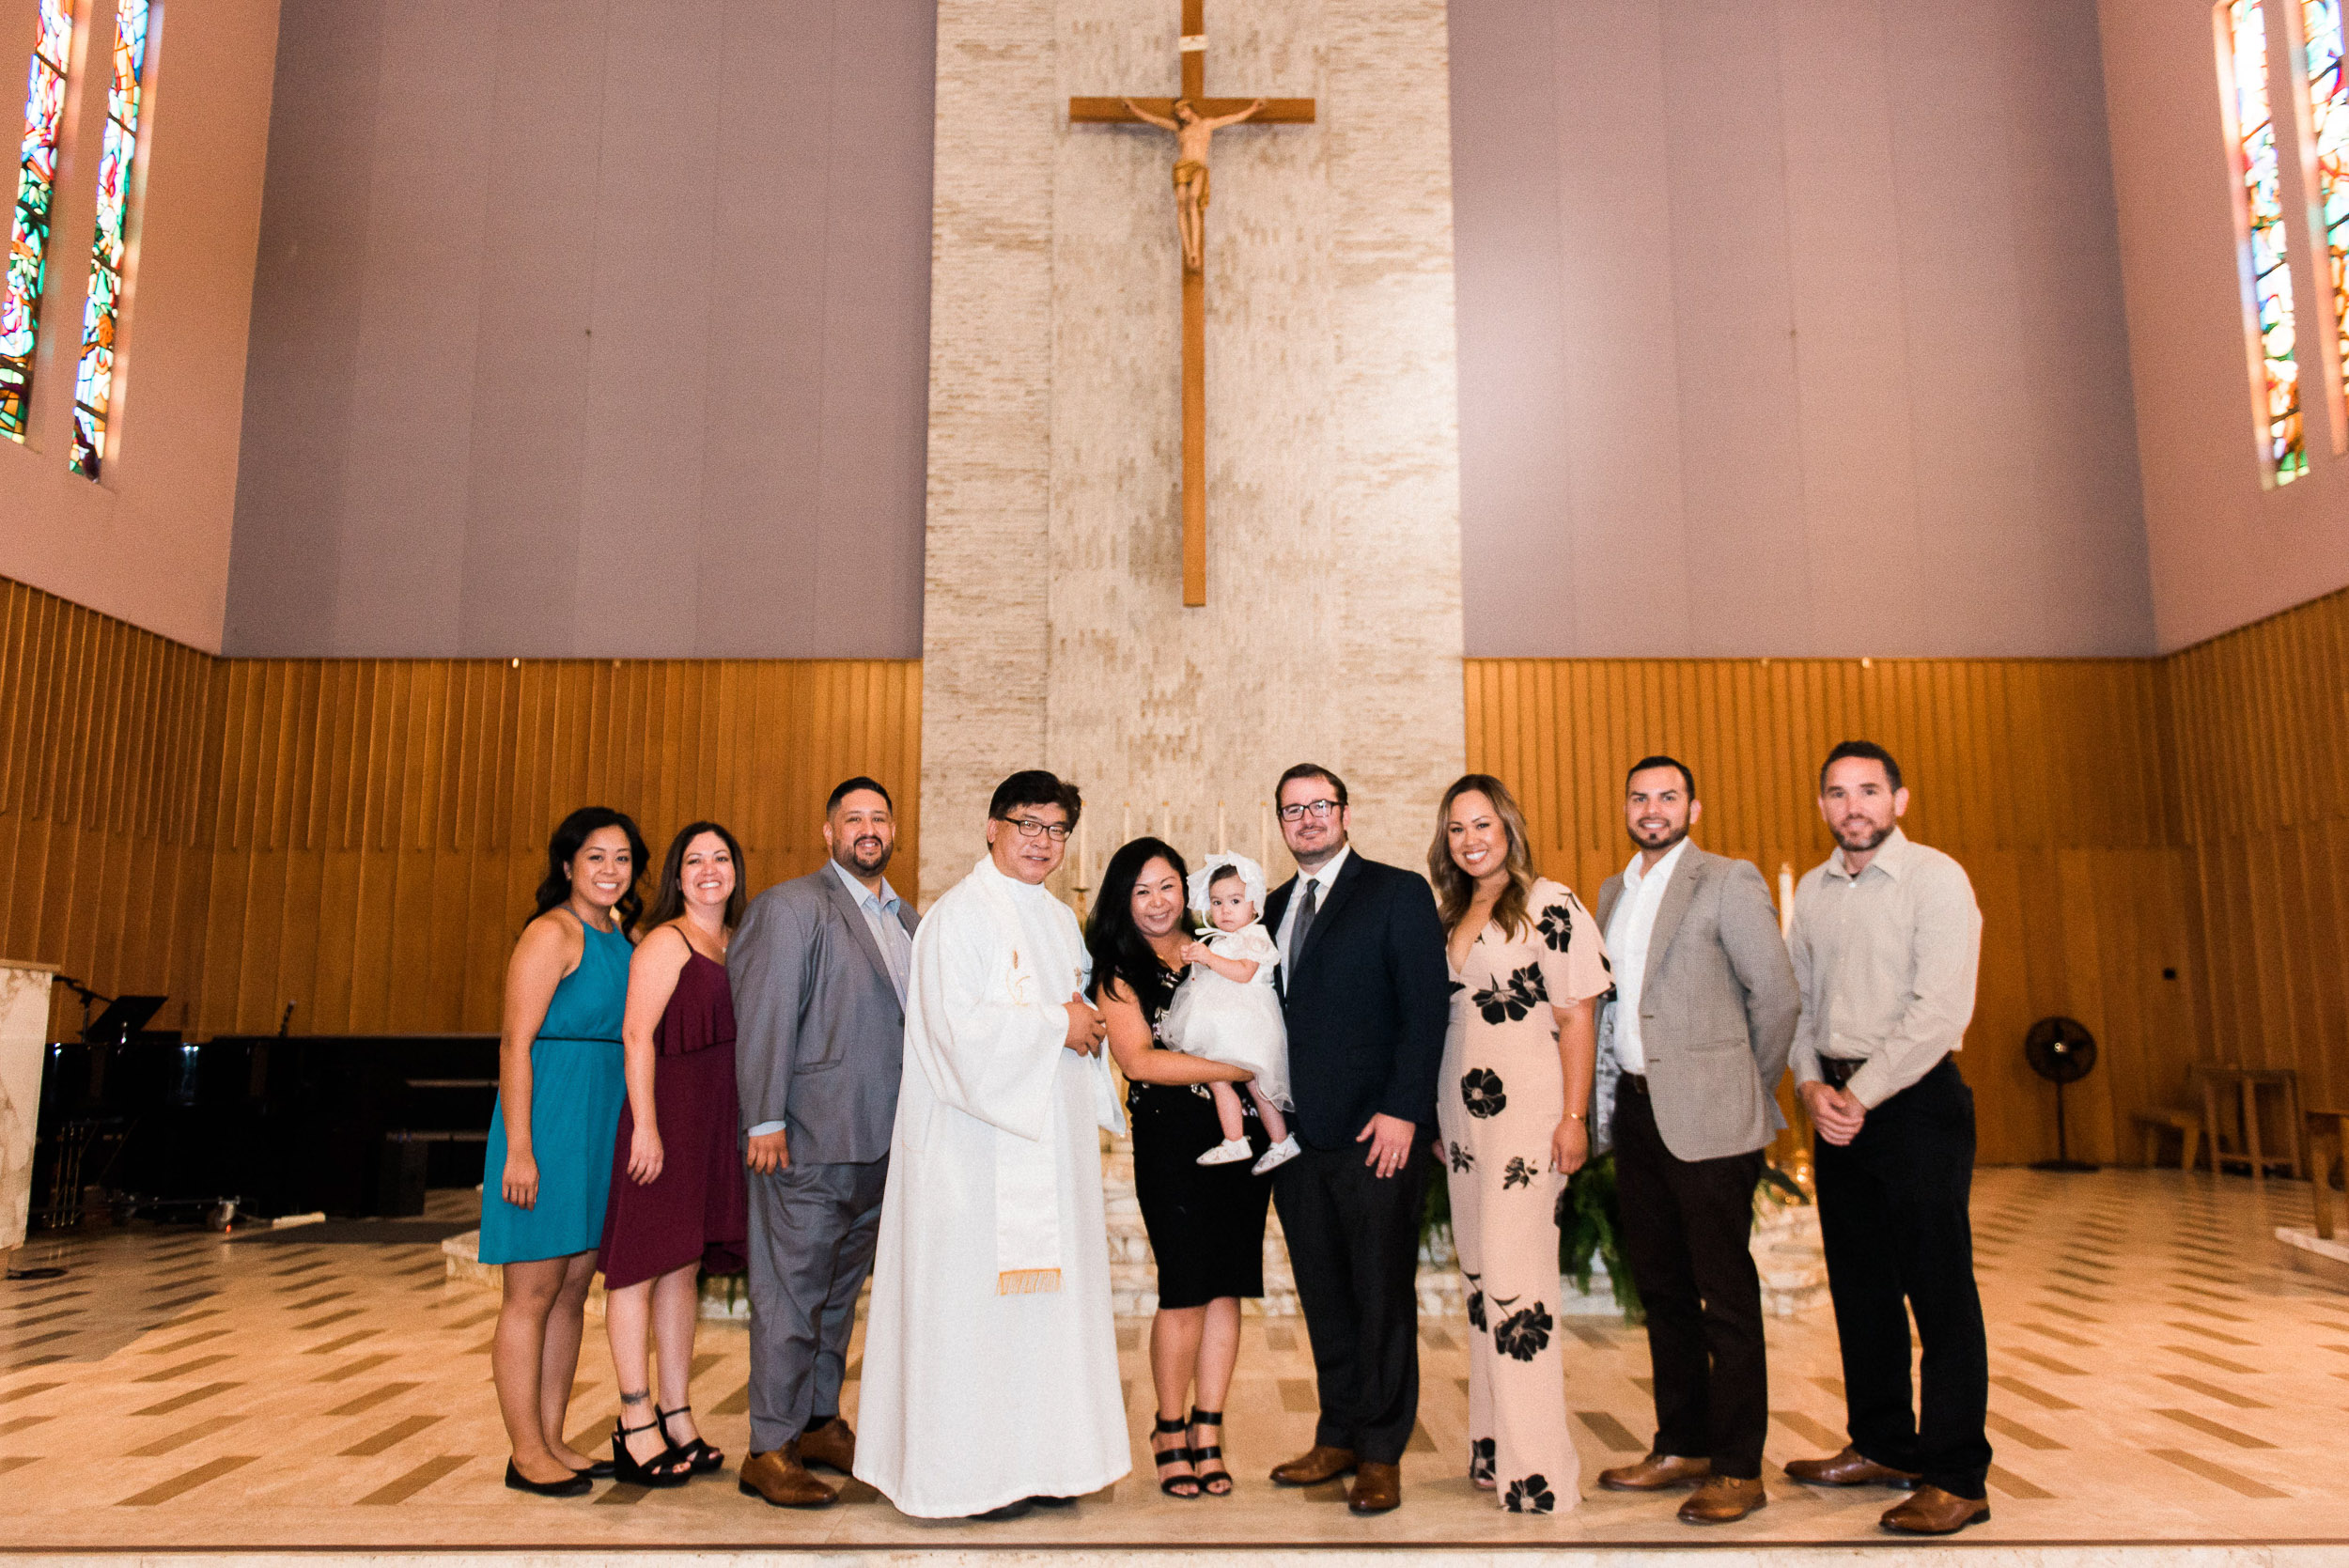 Bryan-Miraflor-Photo-Allison-Baptism-Church-20171014-0215.jpg